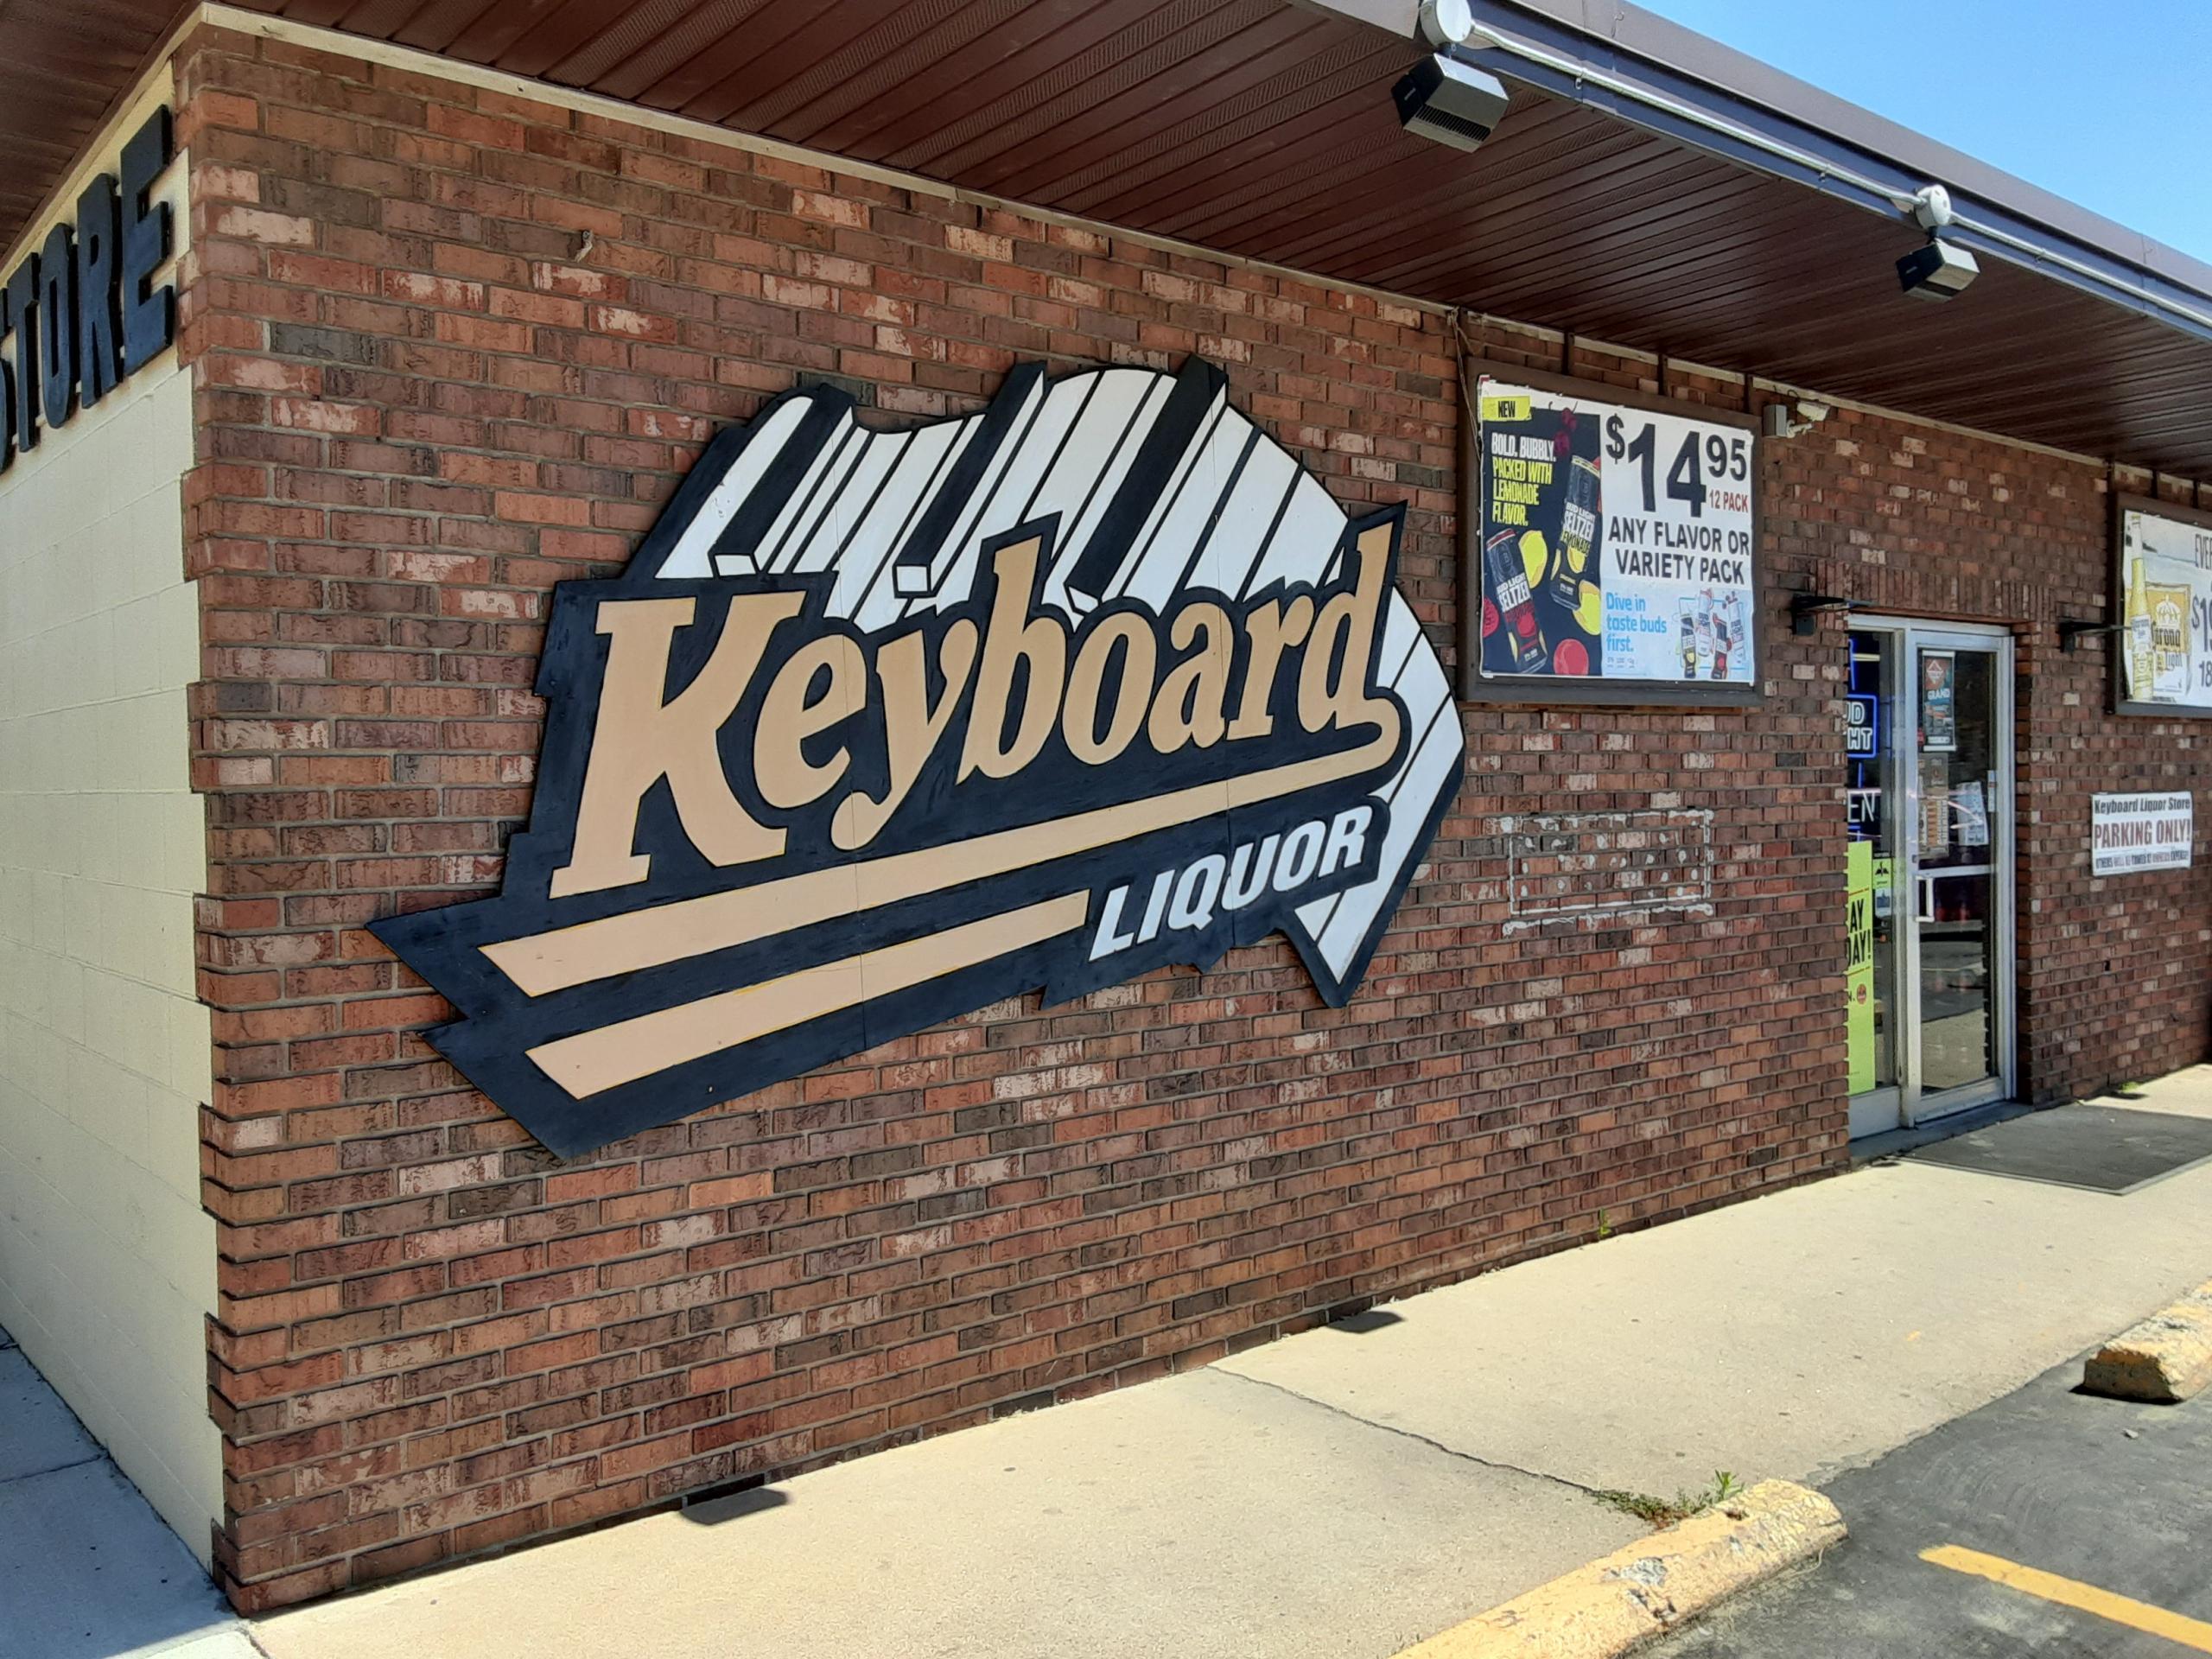 Keyboard Liquor